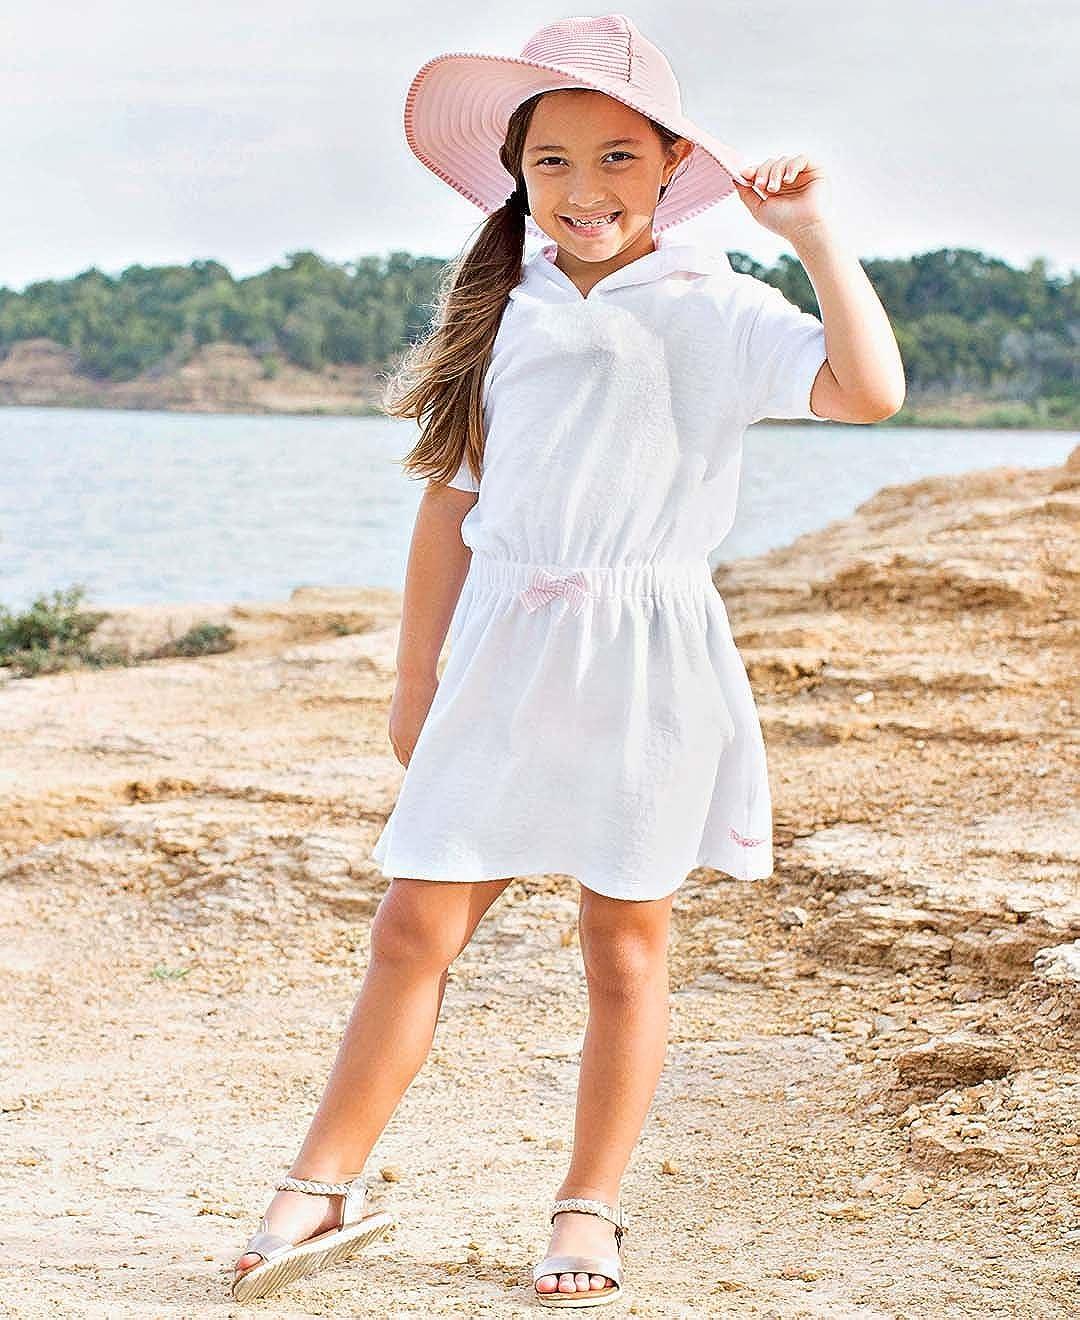 RuffleButts Baby//Toddler Girls Terry Cloth Hoodie Swim Beach Cover Up Dress